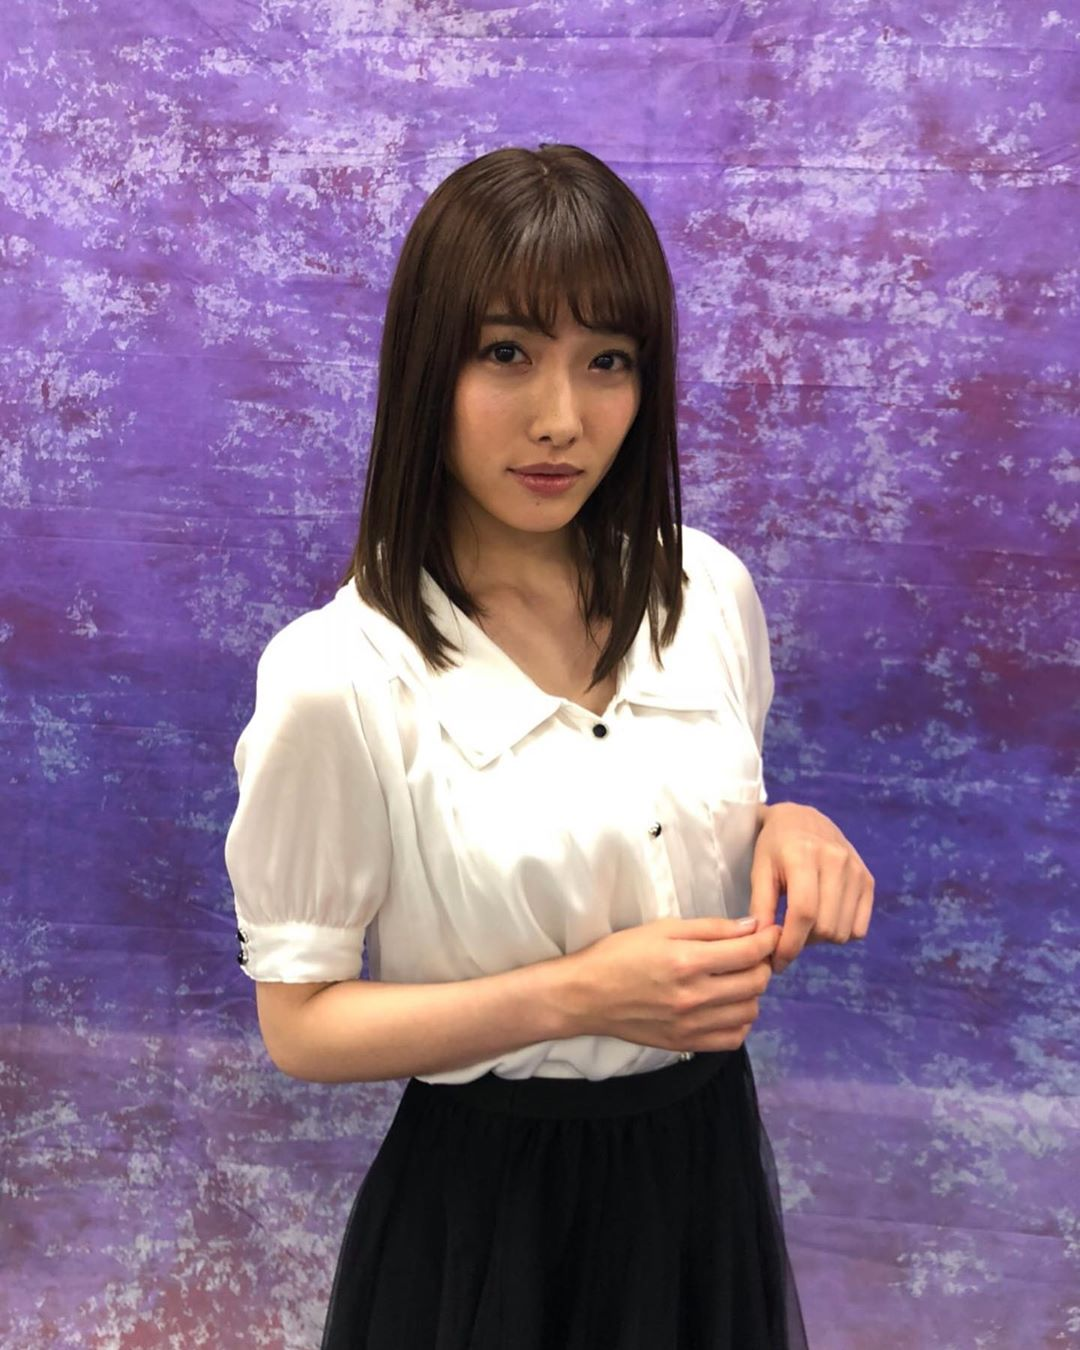 konno_anna202.jpg